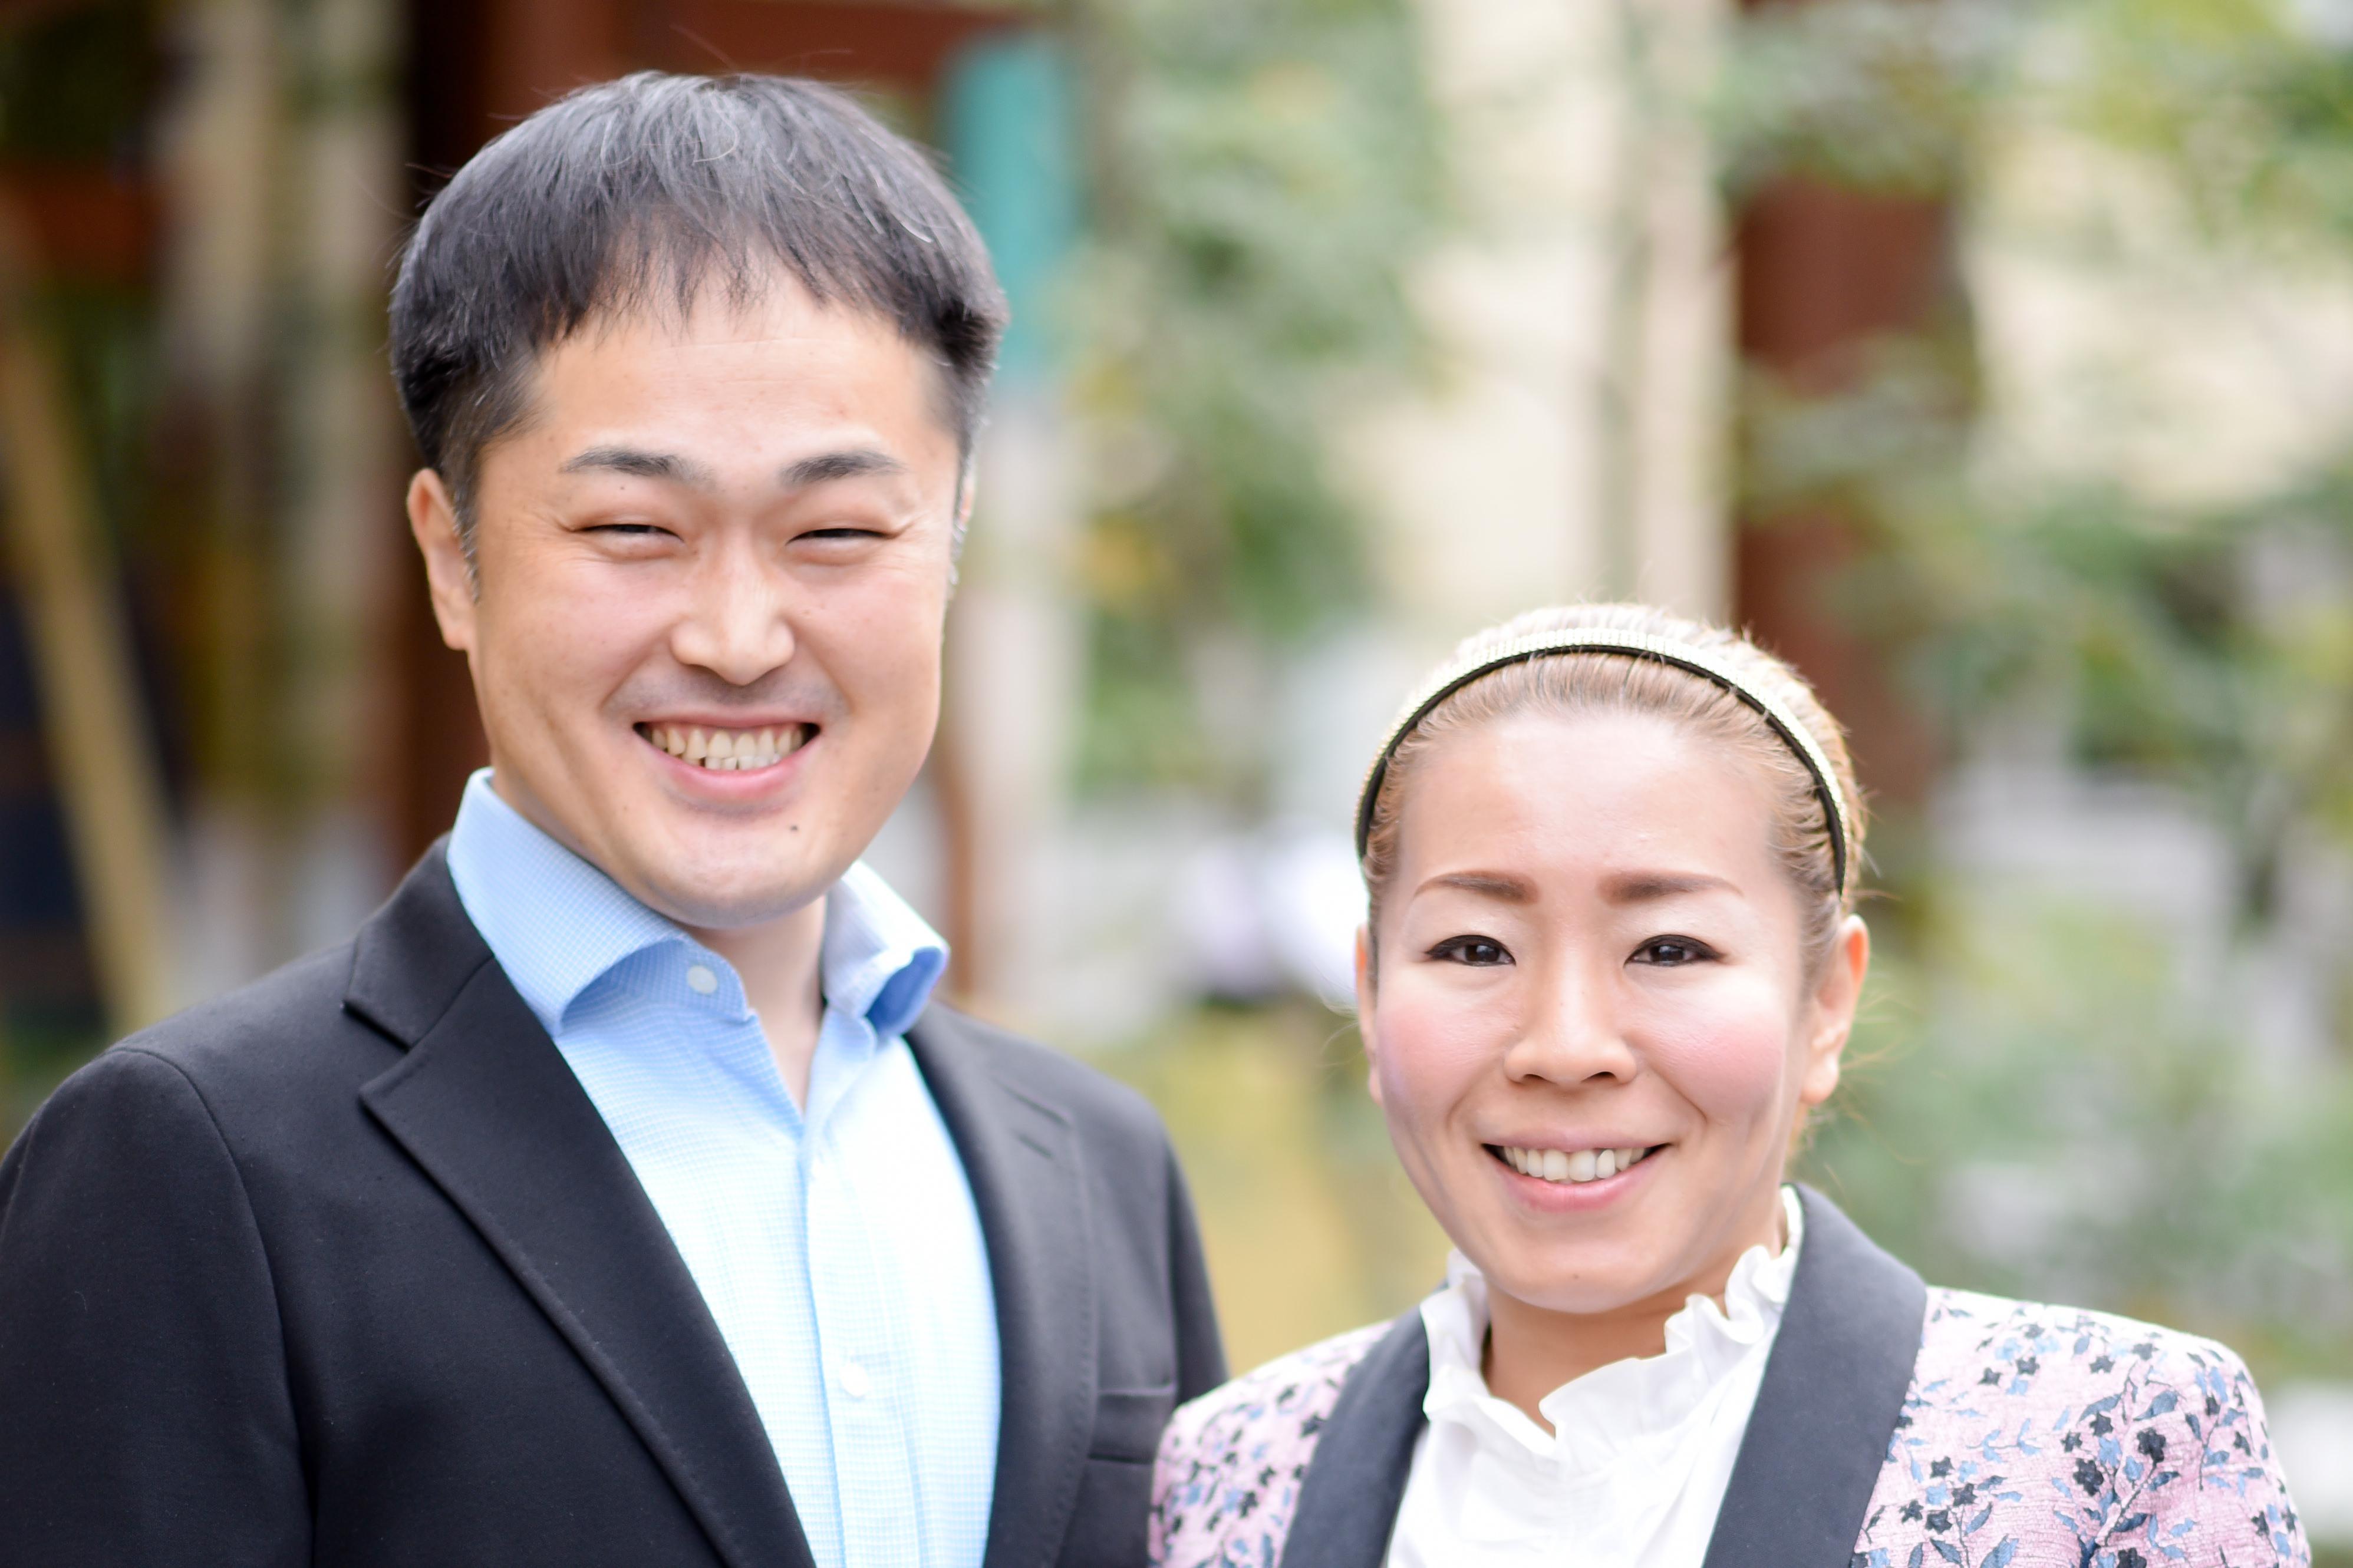 竹田秀光の写真